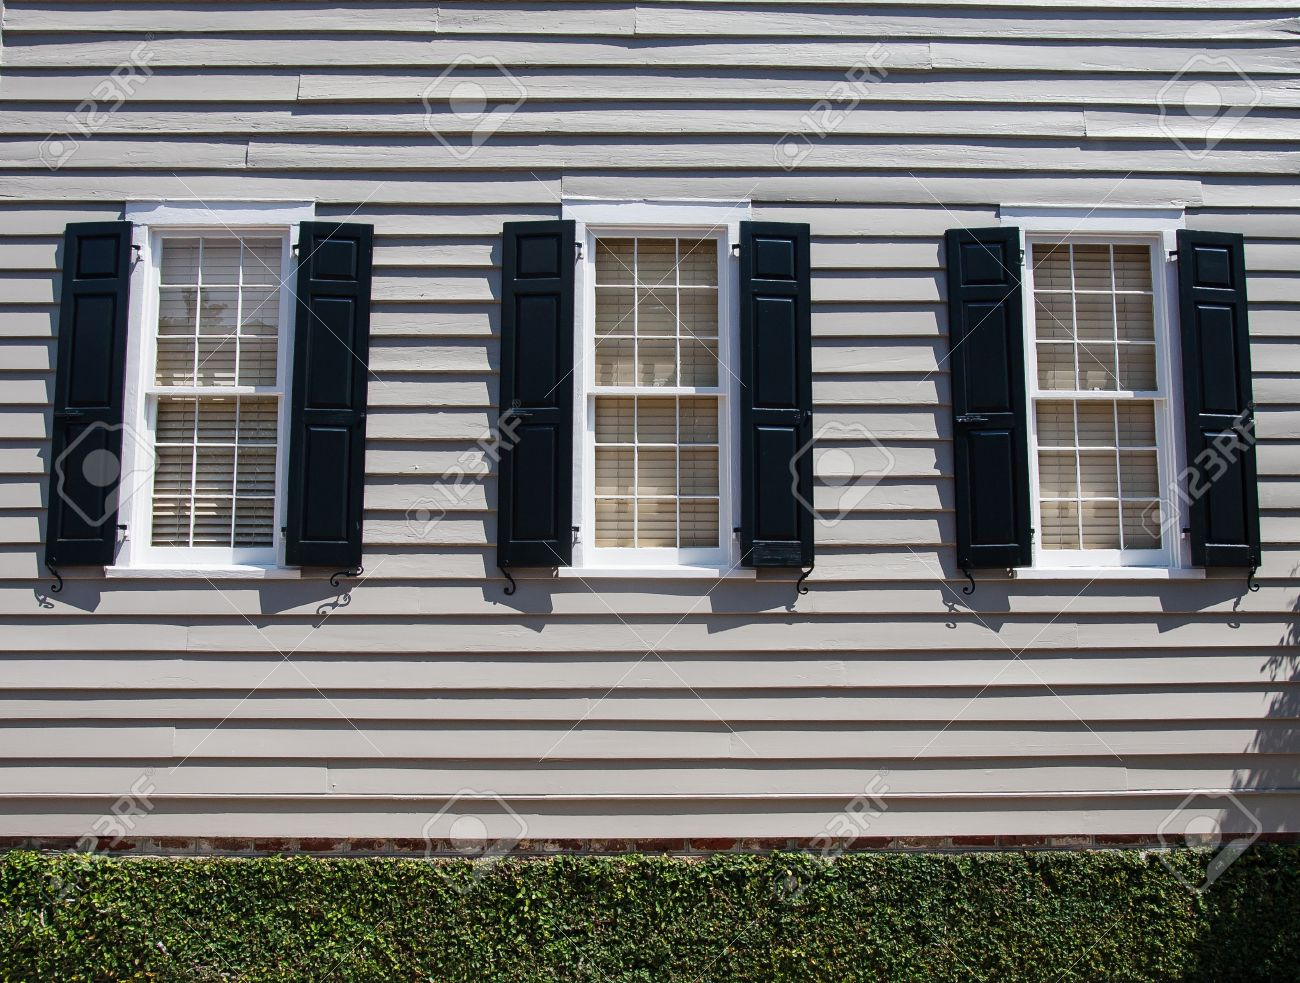 Black shutters for sophistication